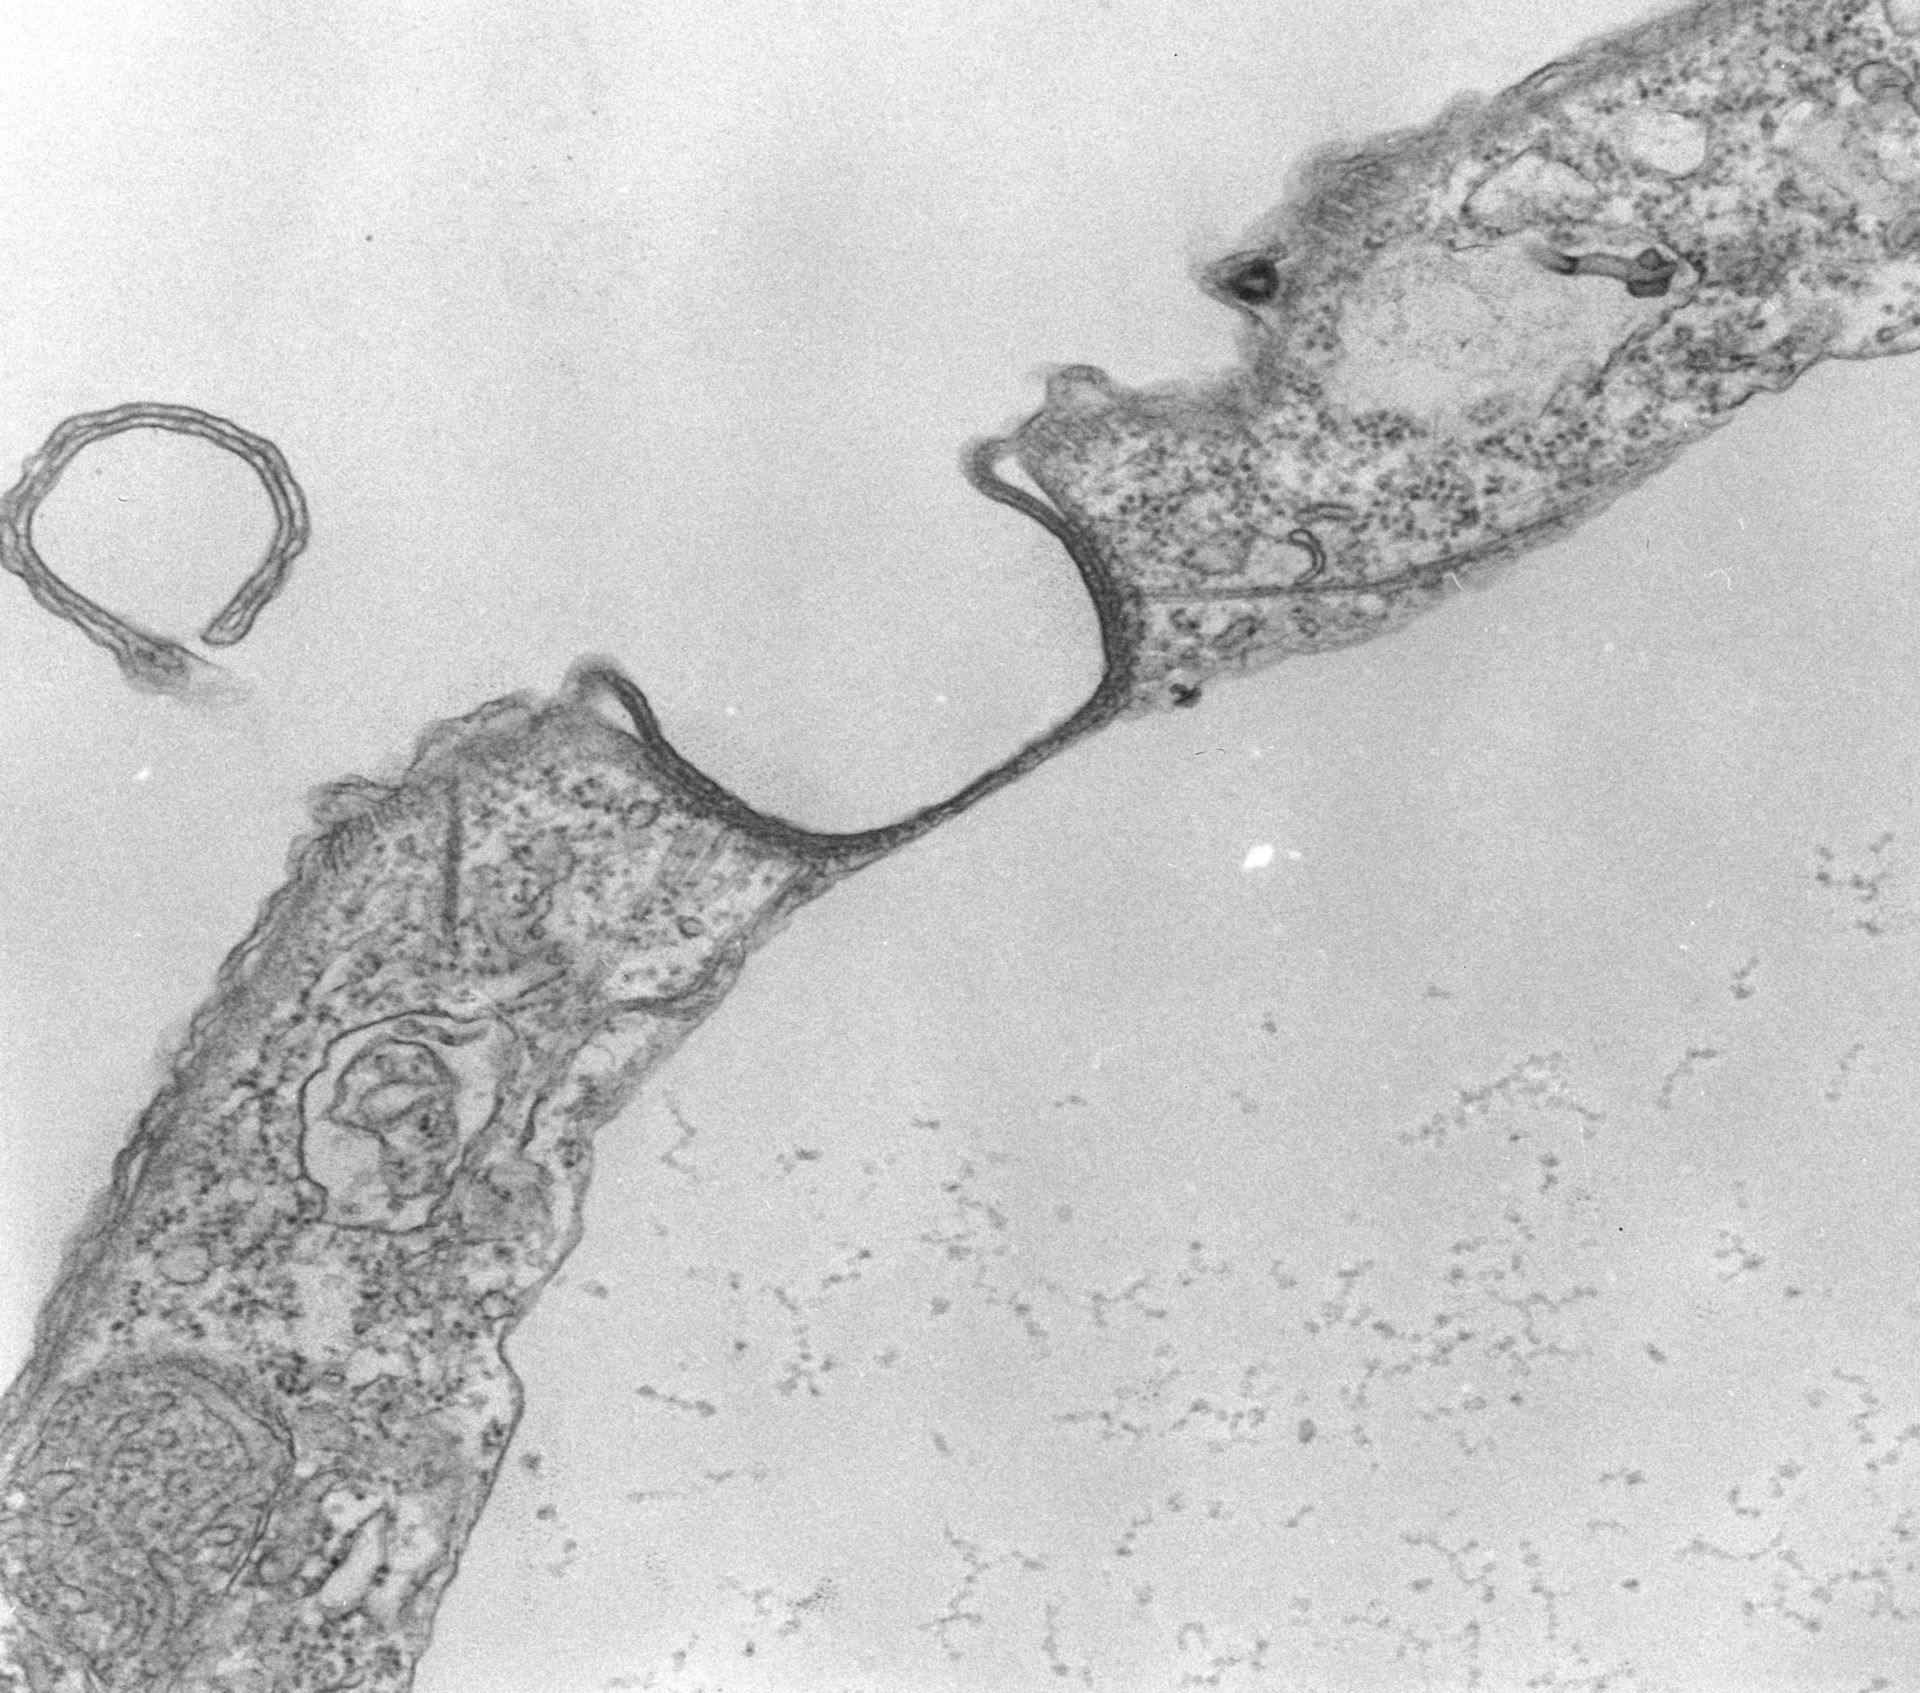 Tetrahymena pyriformis (complesso associato ai microtubuli) - CIL:39793